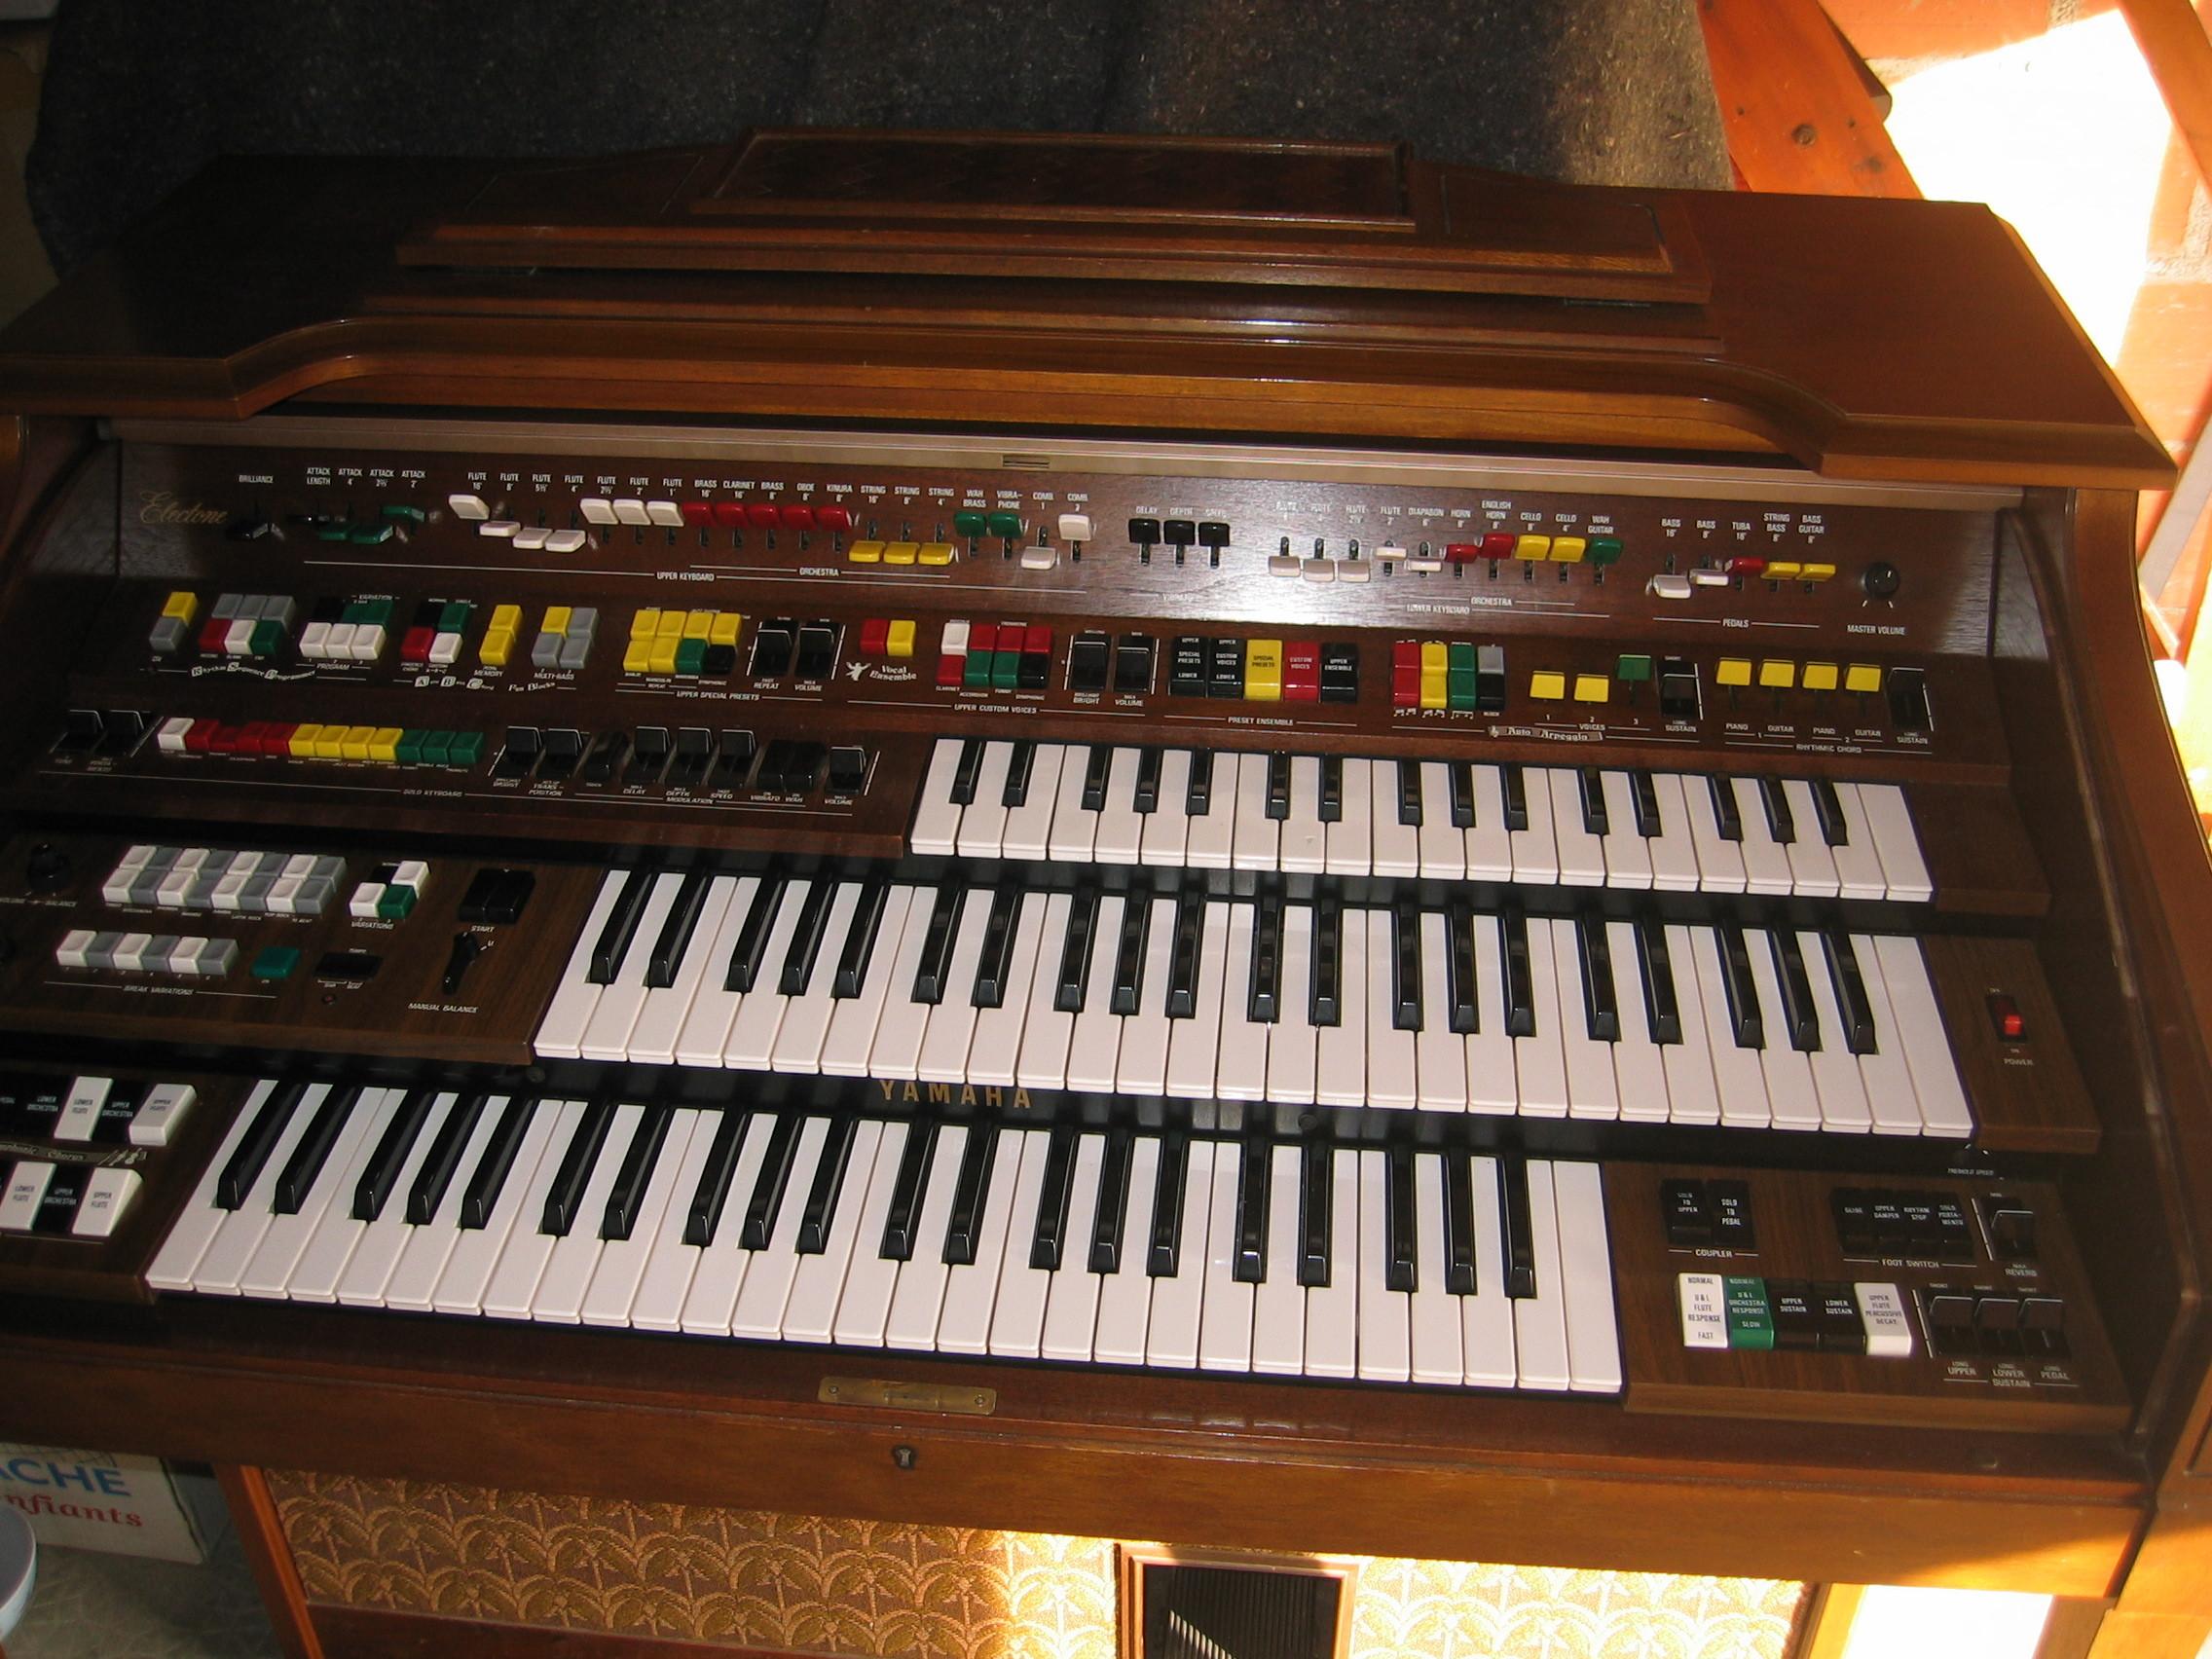 Yamaha electone d85 image 226141 audiofanzine for Yamaha electone organ models